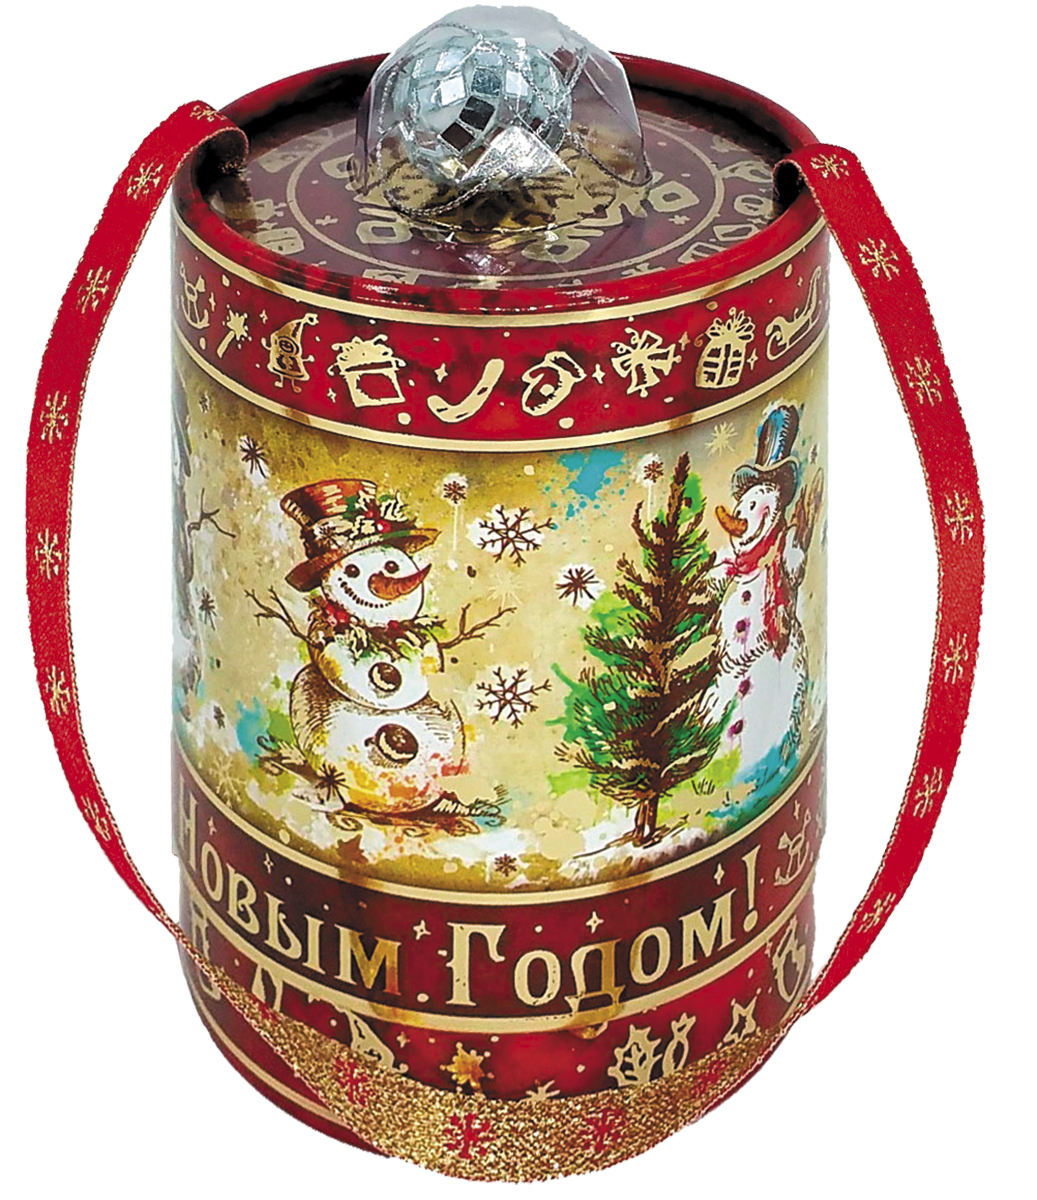 Teabreeze Снеговики чай ассам, 100 г 2005 чай ассам хармутти оптом